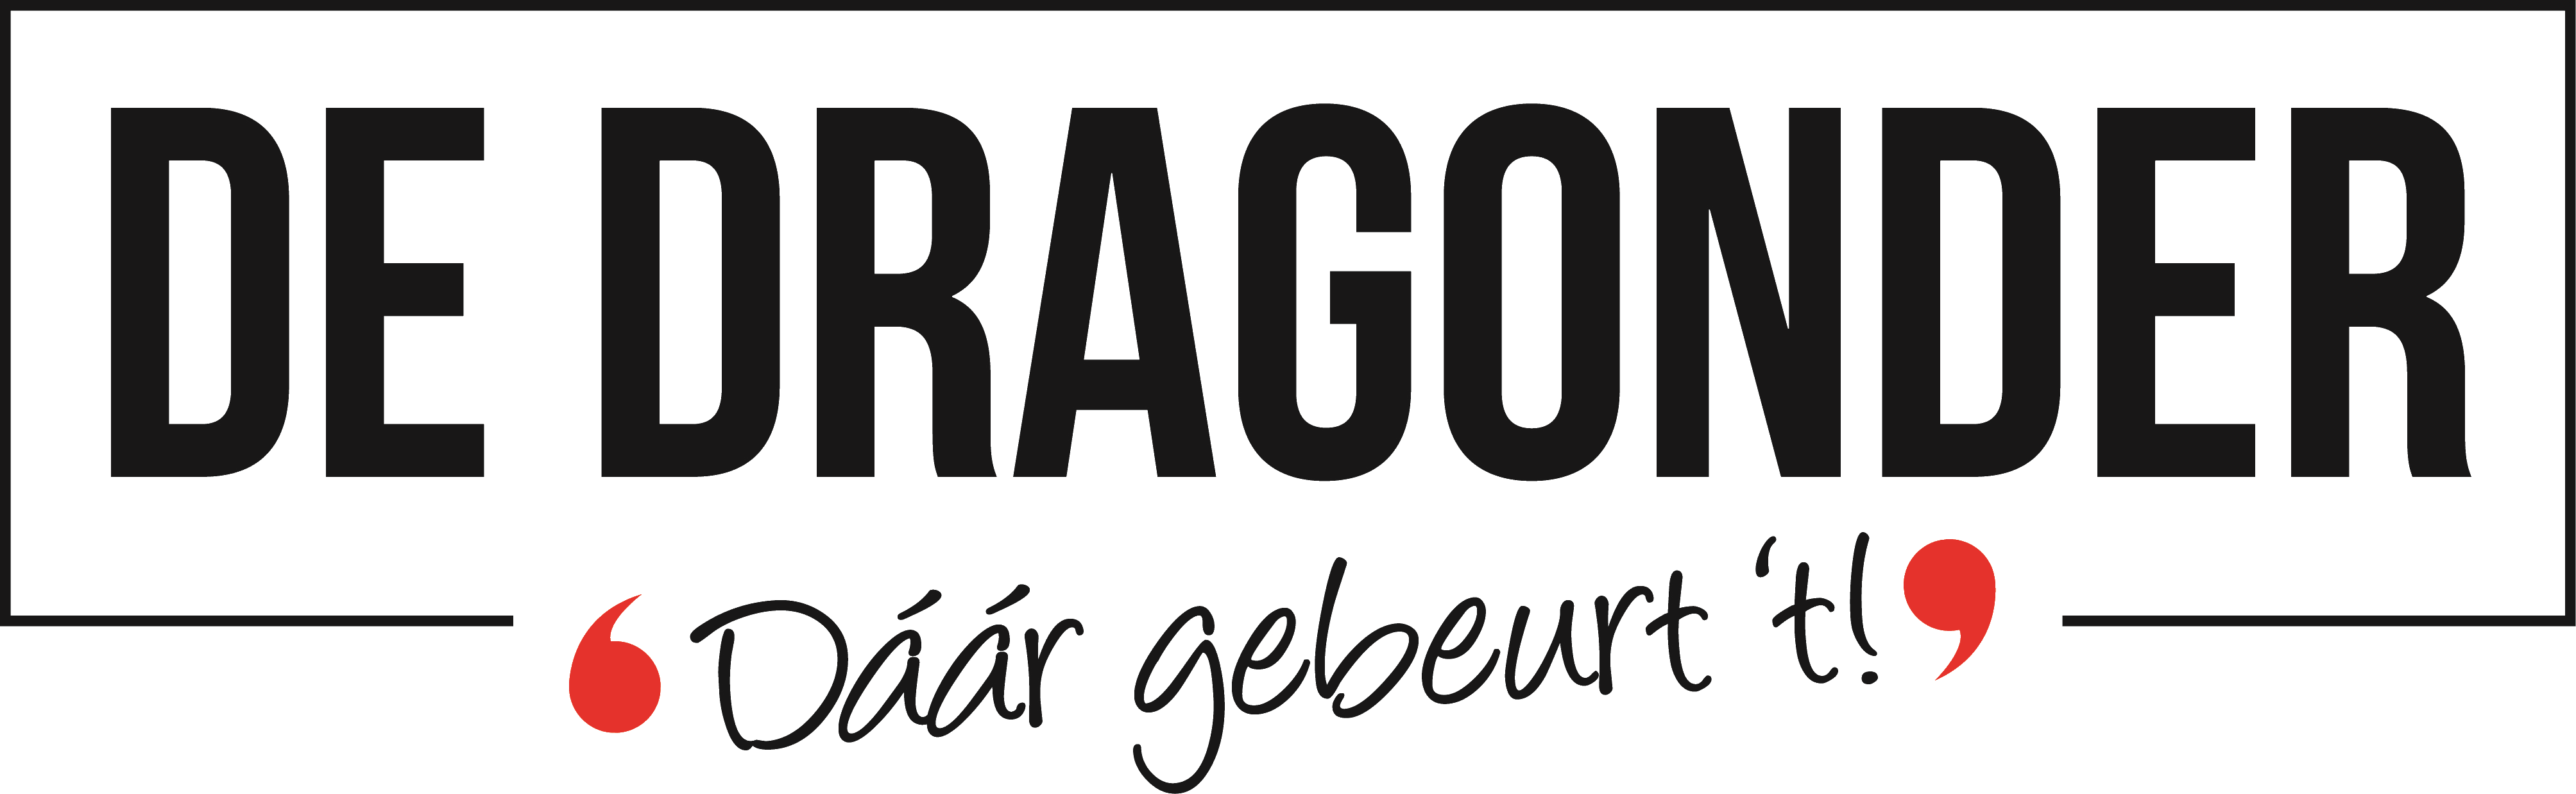 De Dragonder